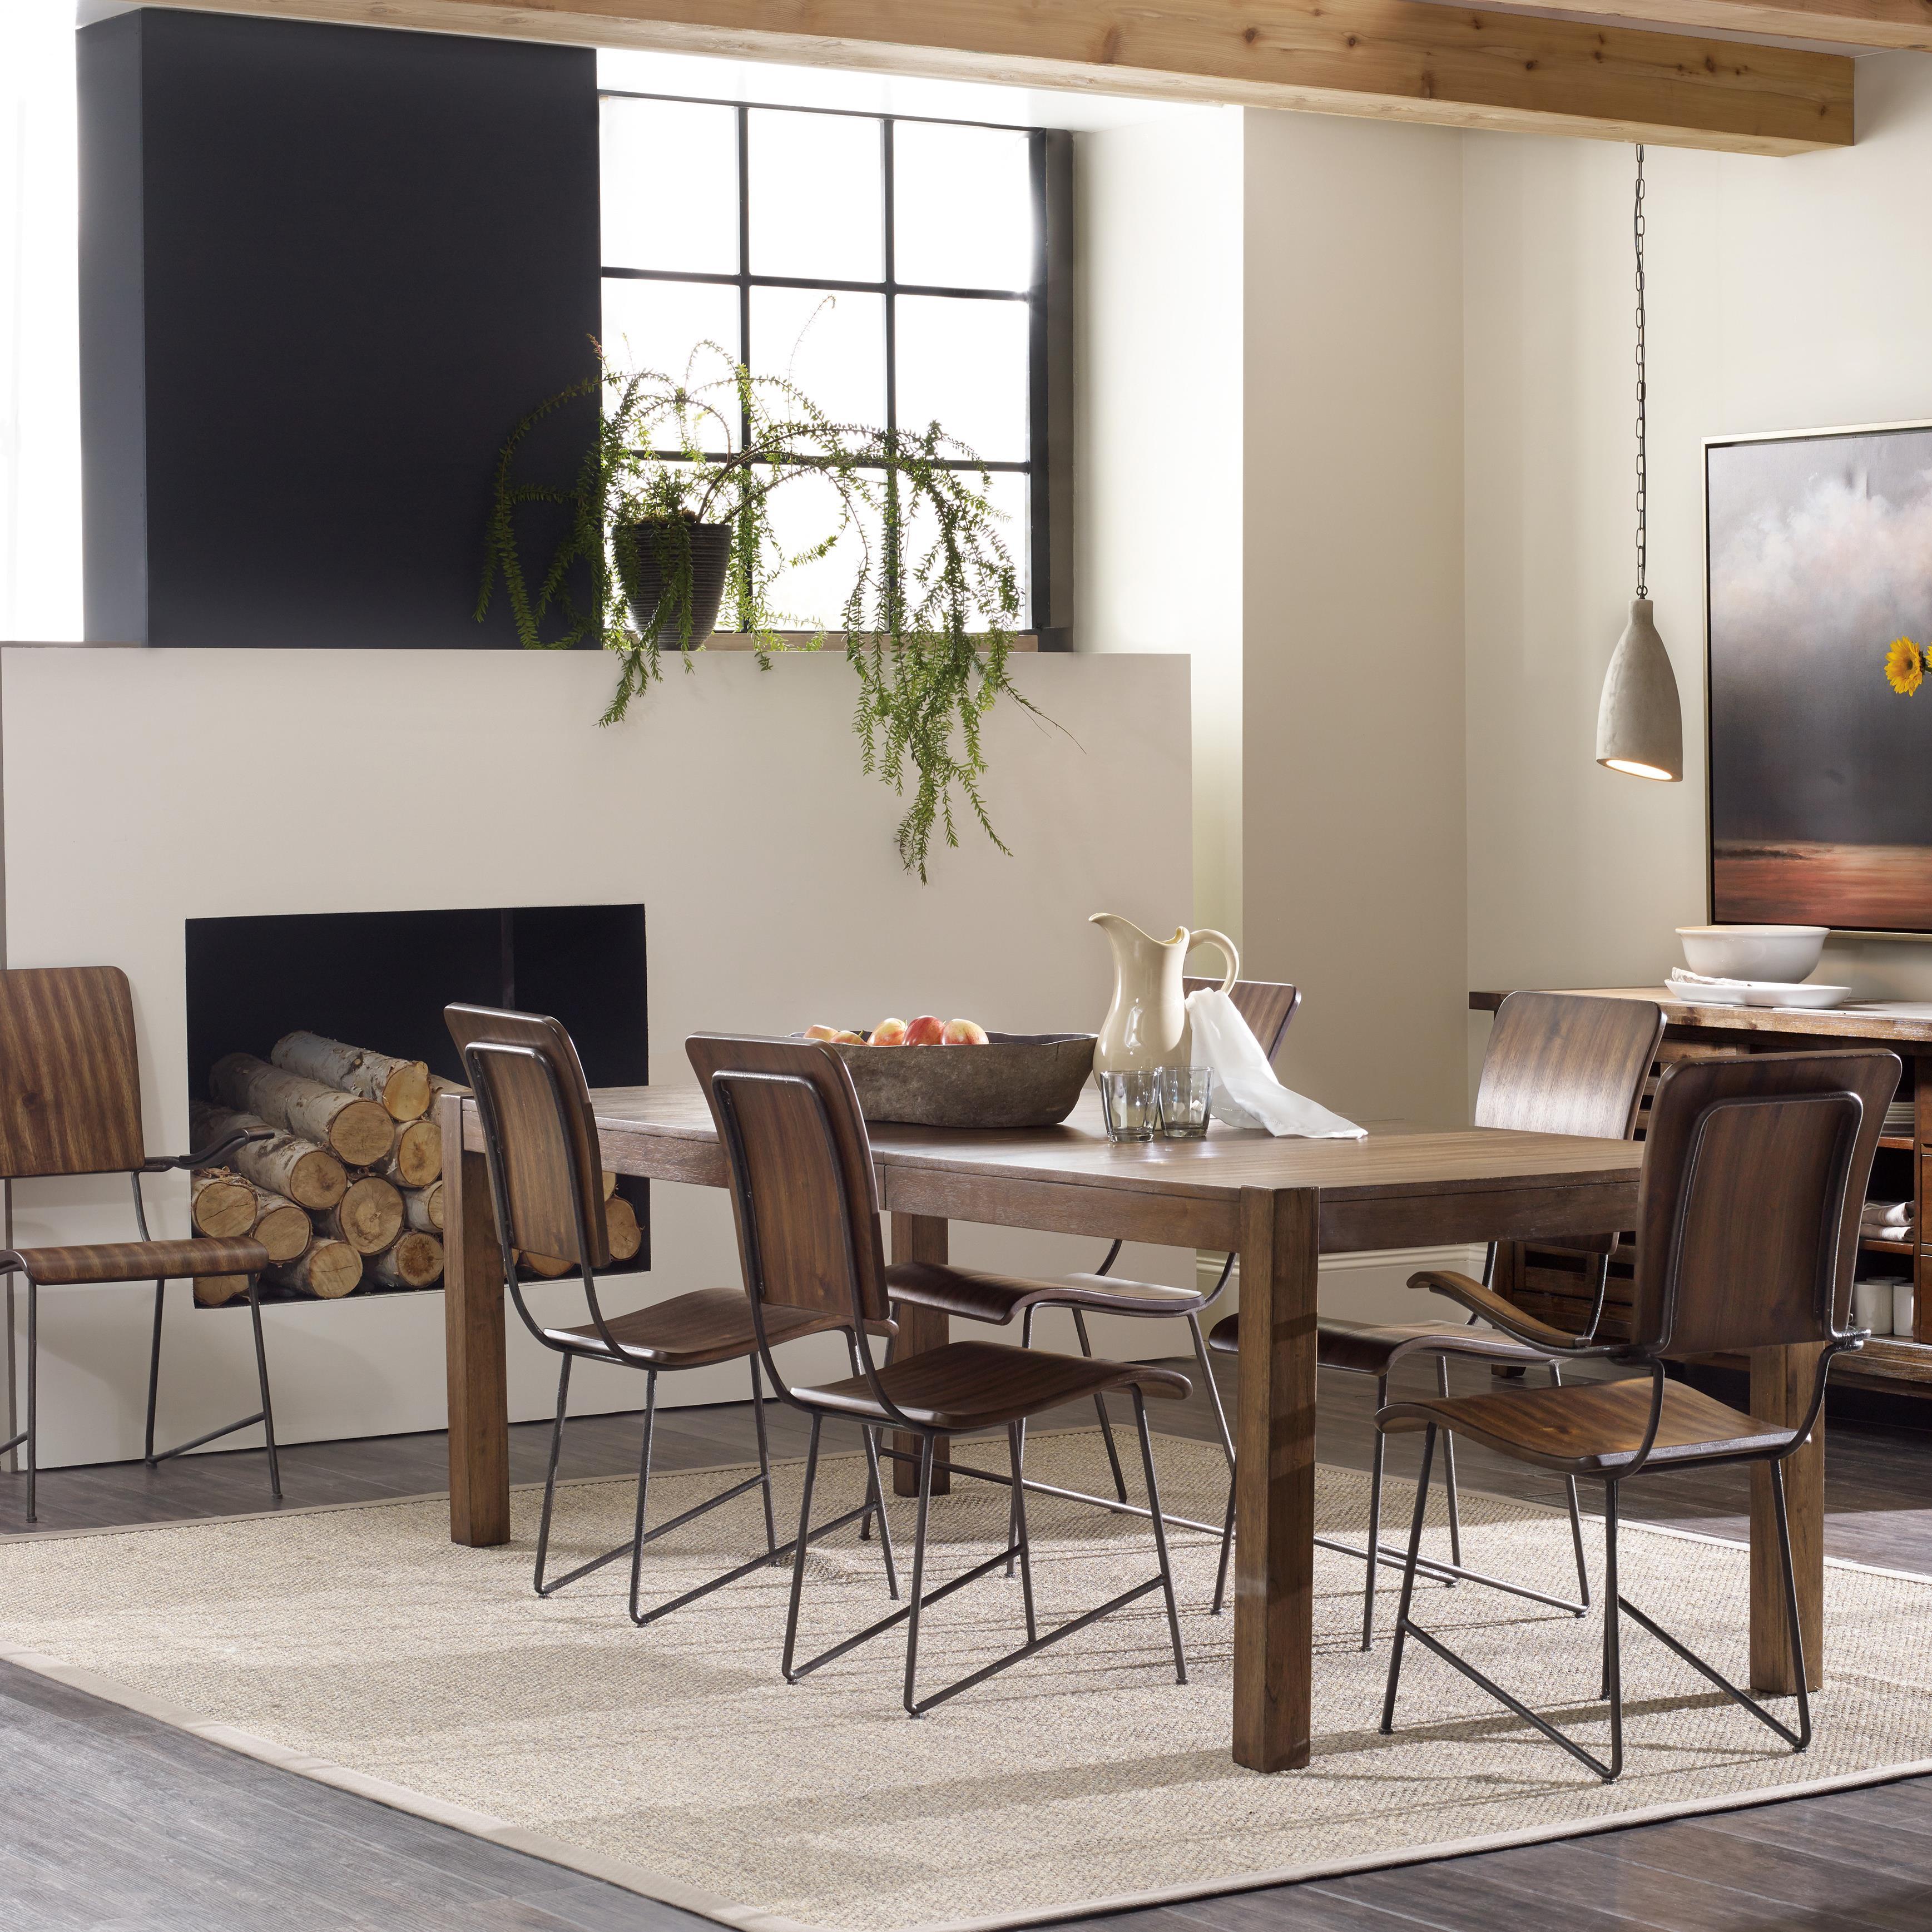 Hooker Furniture Studio 7H 7 Piece Dining Set - Item Number: 5388-75200+2x300+4x310